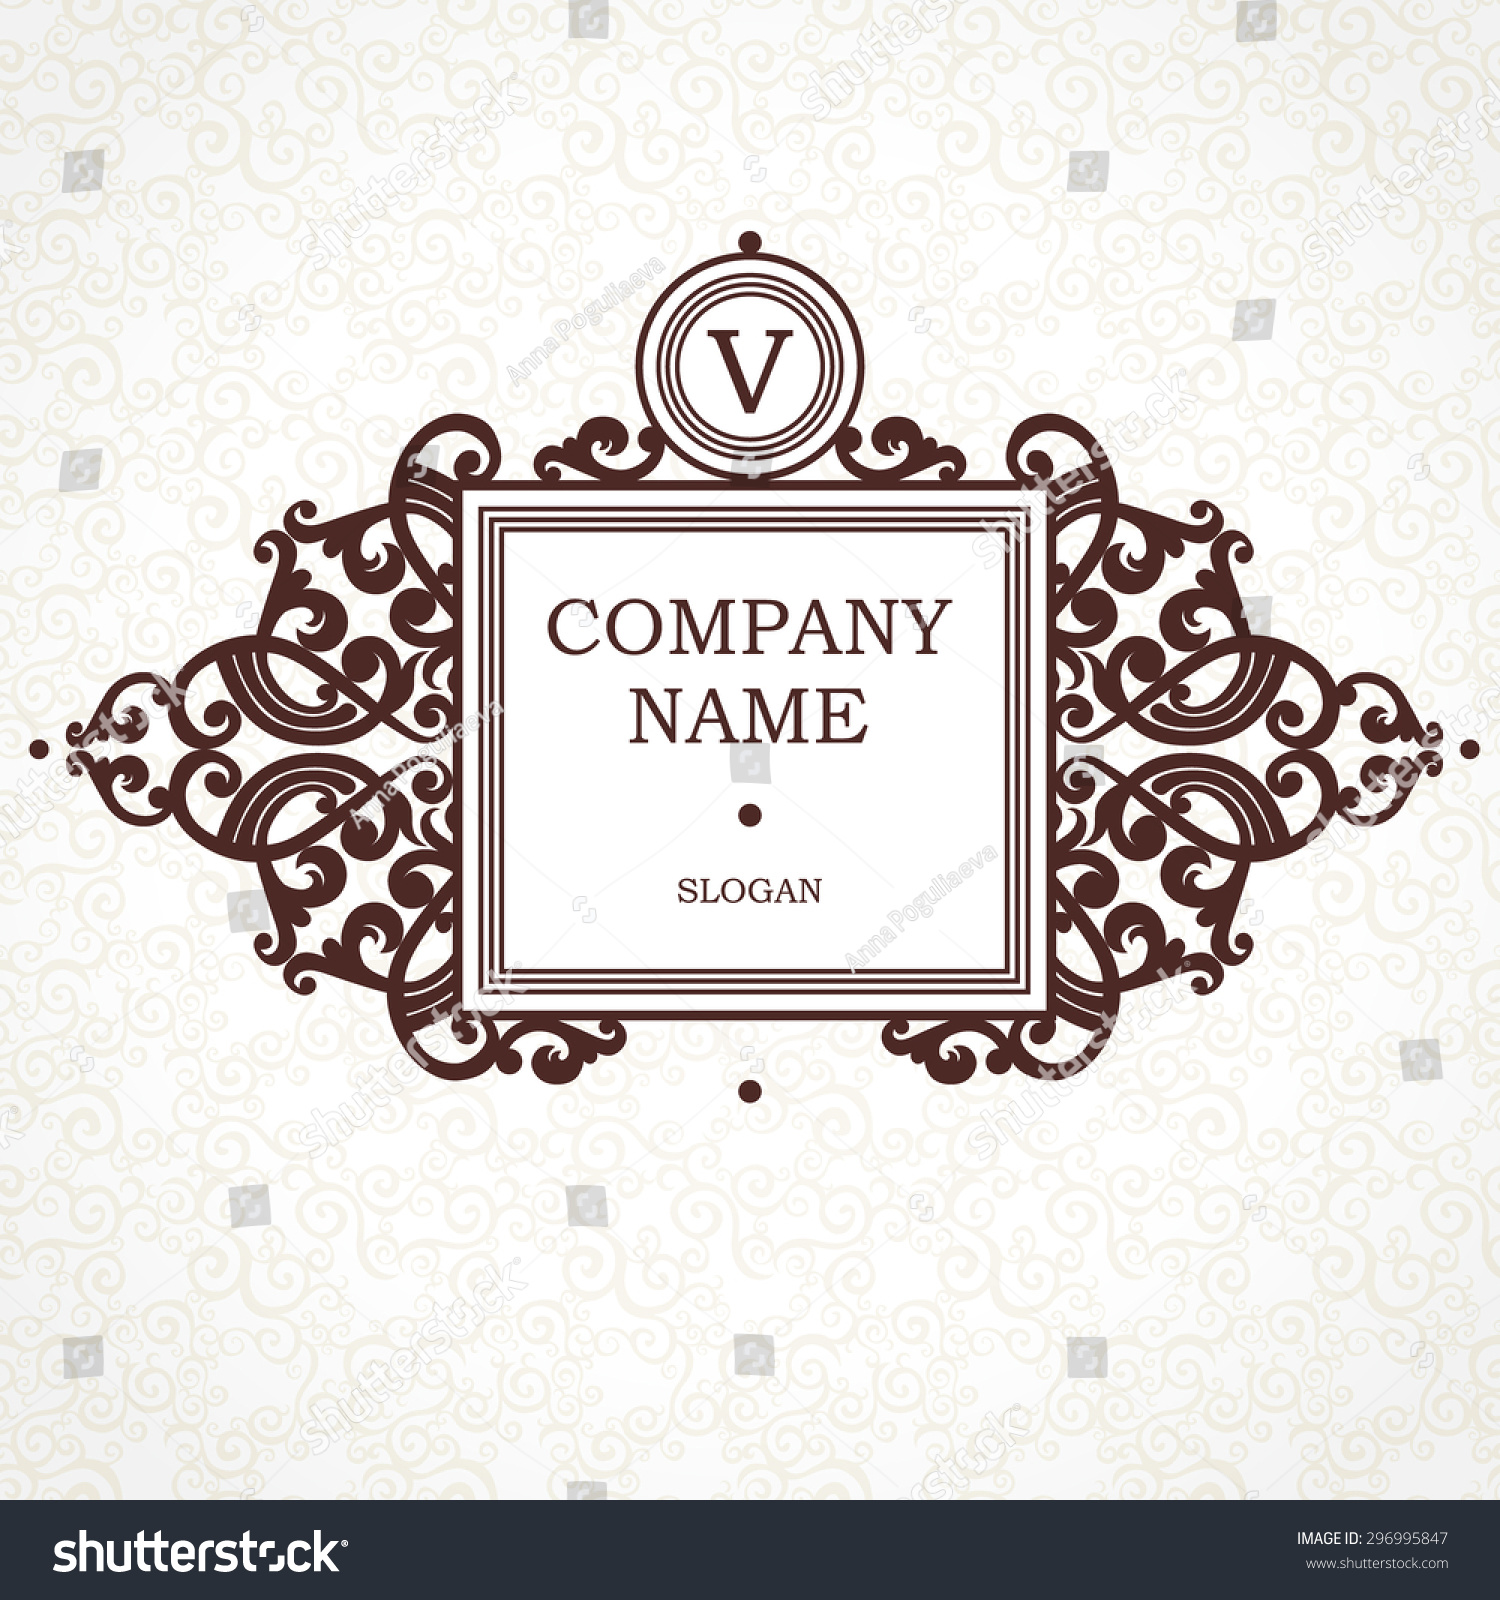 Vector Logo Template Victorian Style Ornate Stock Vector (2018 ...